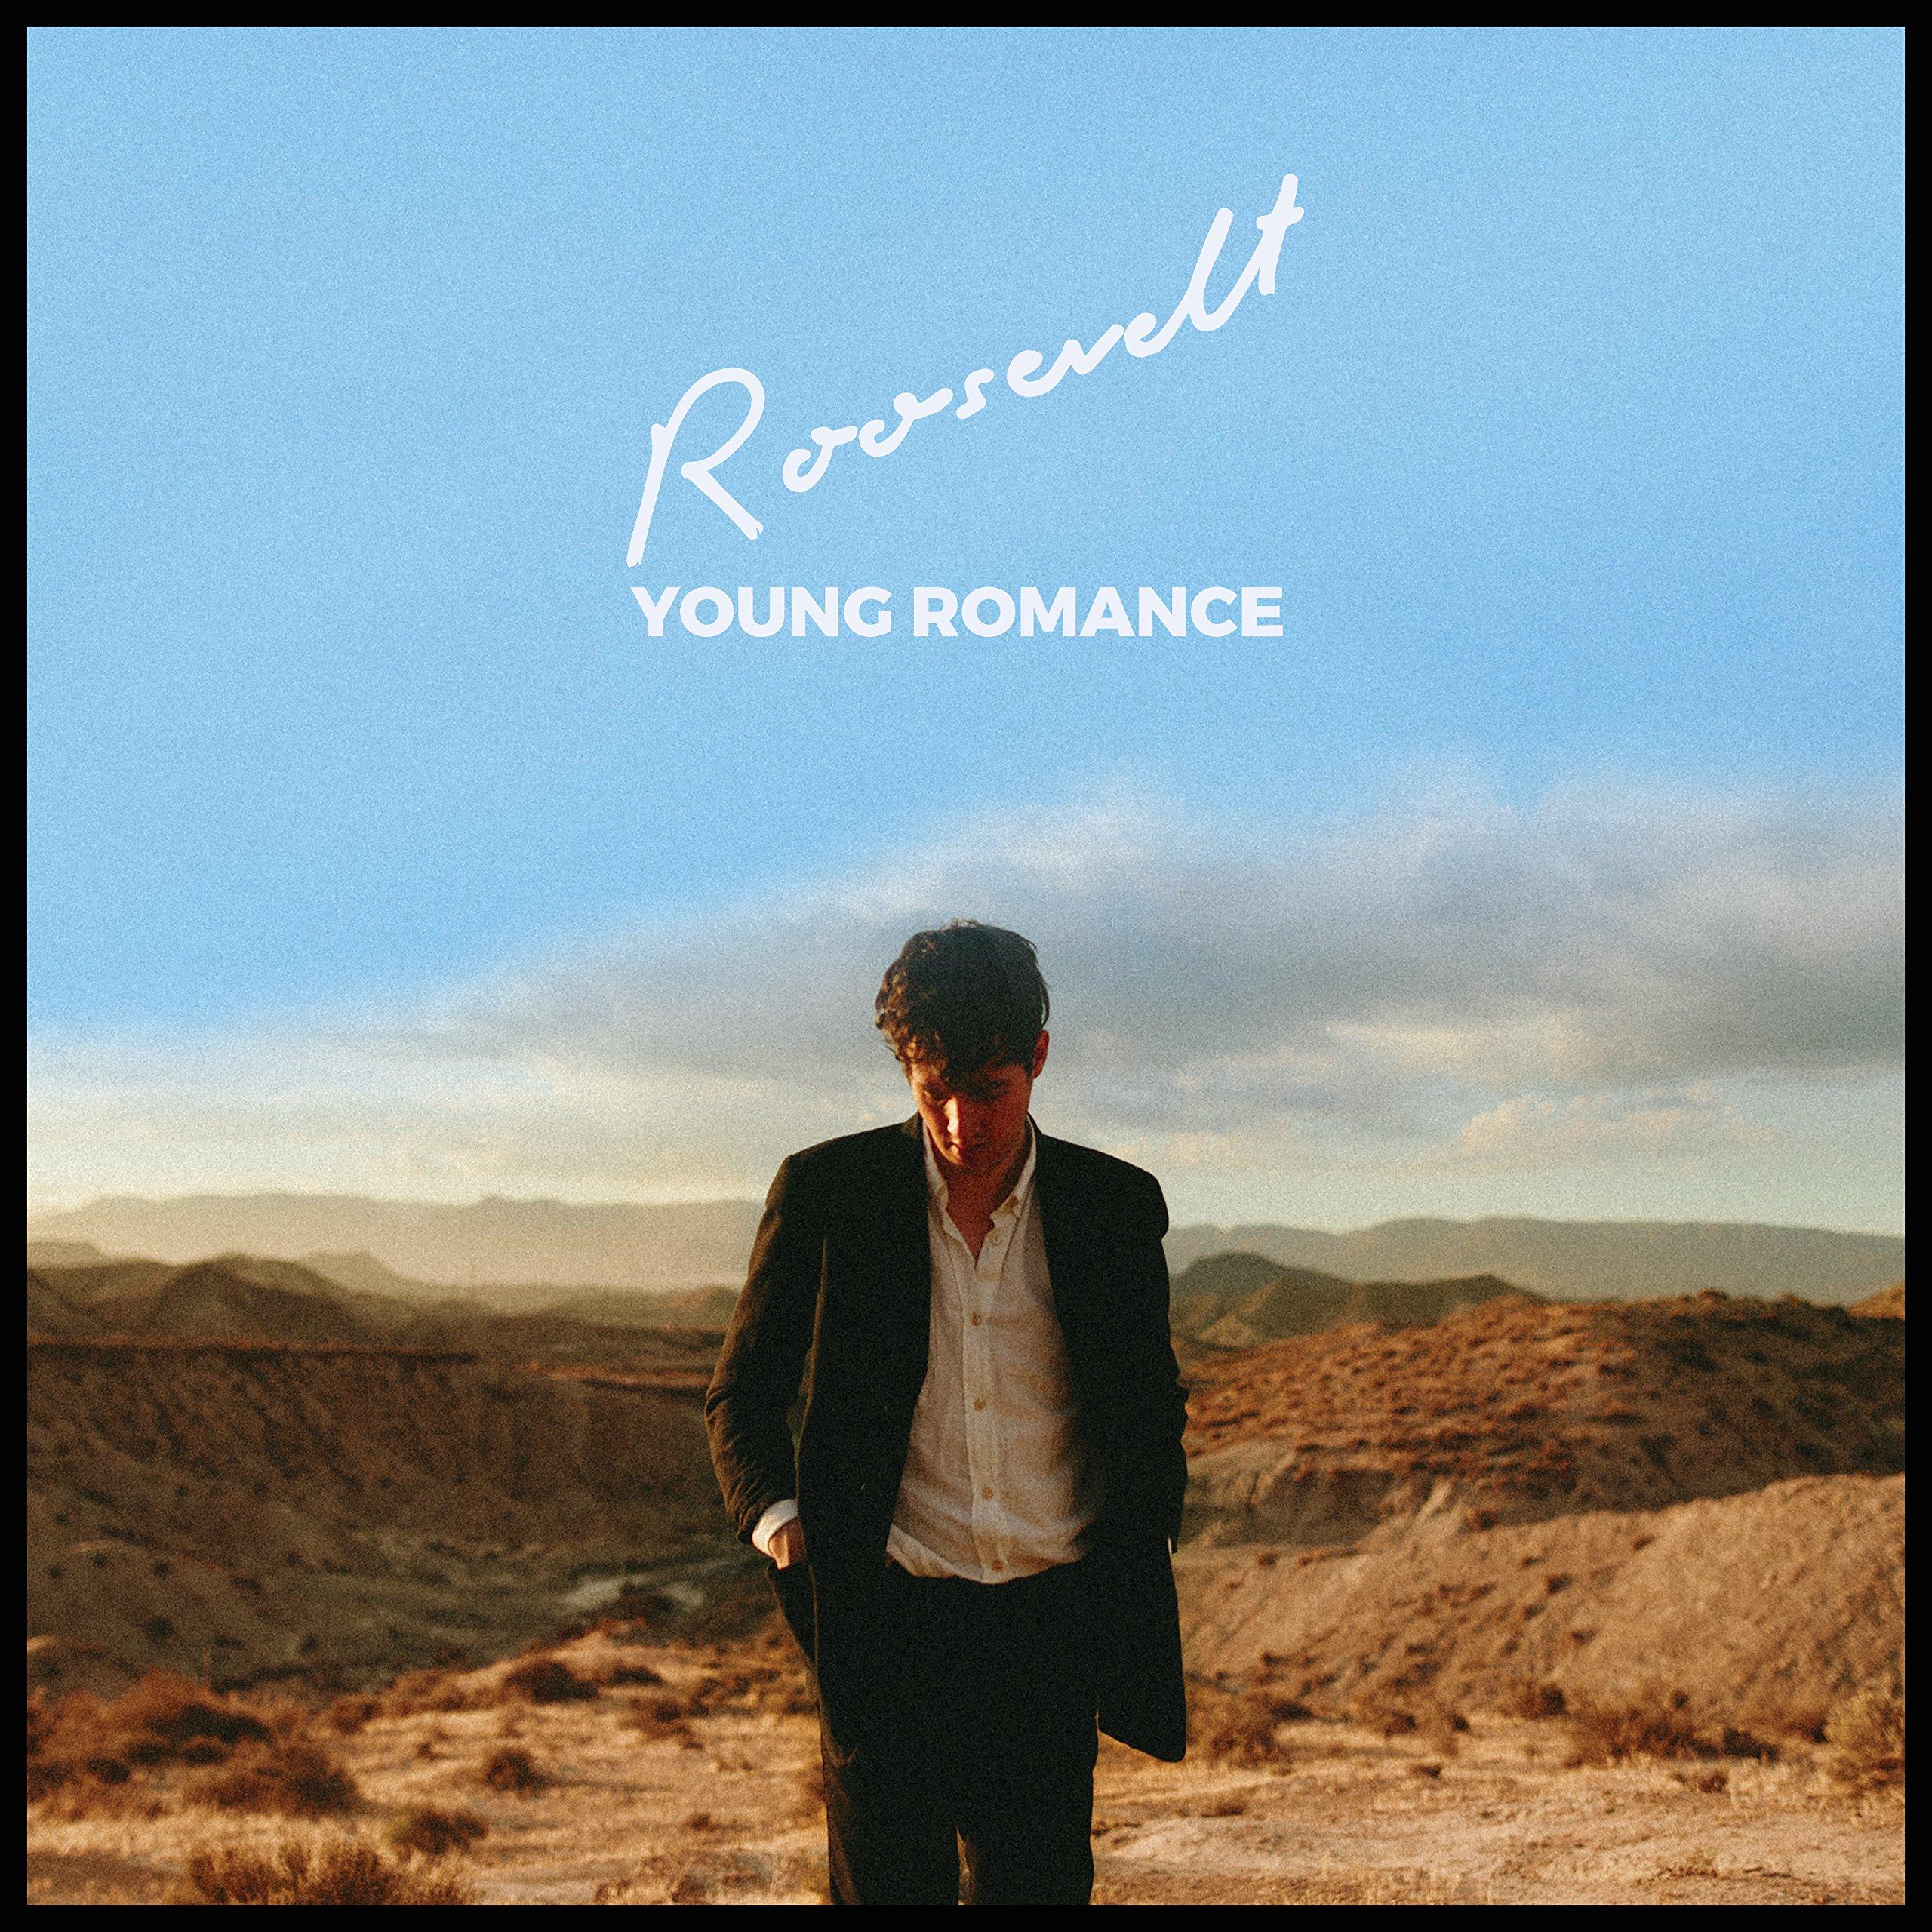 Cassette : The Roosevelt - Young Romance (Cassette)